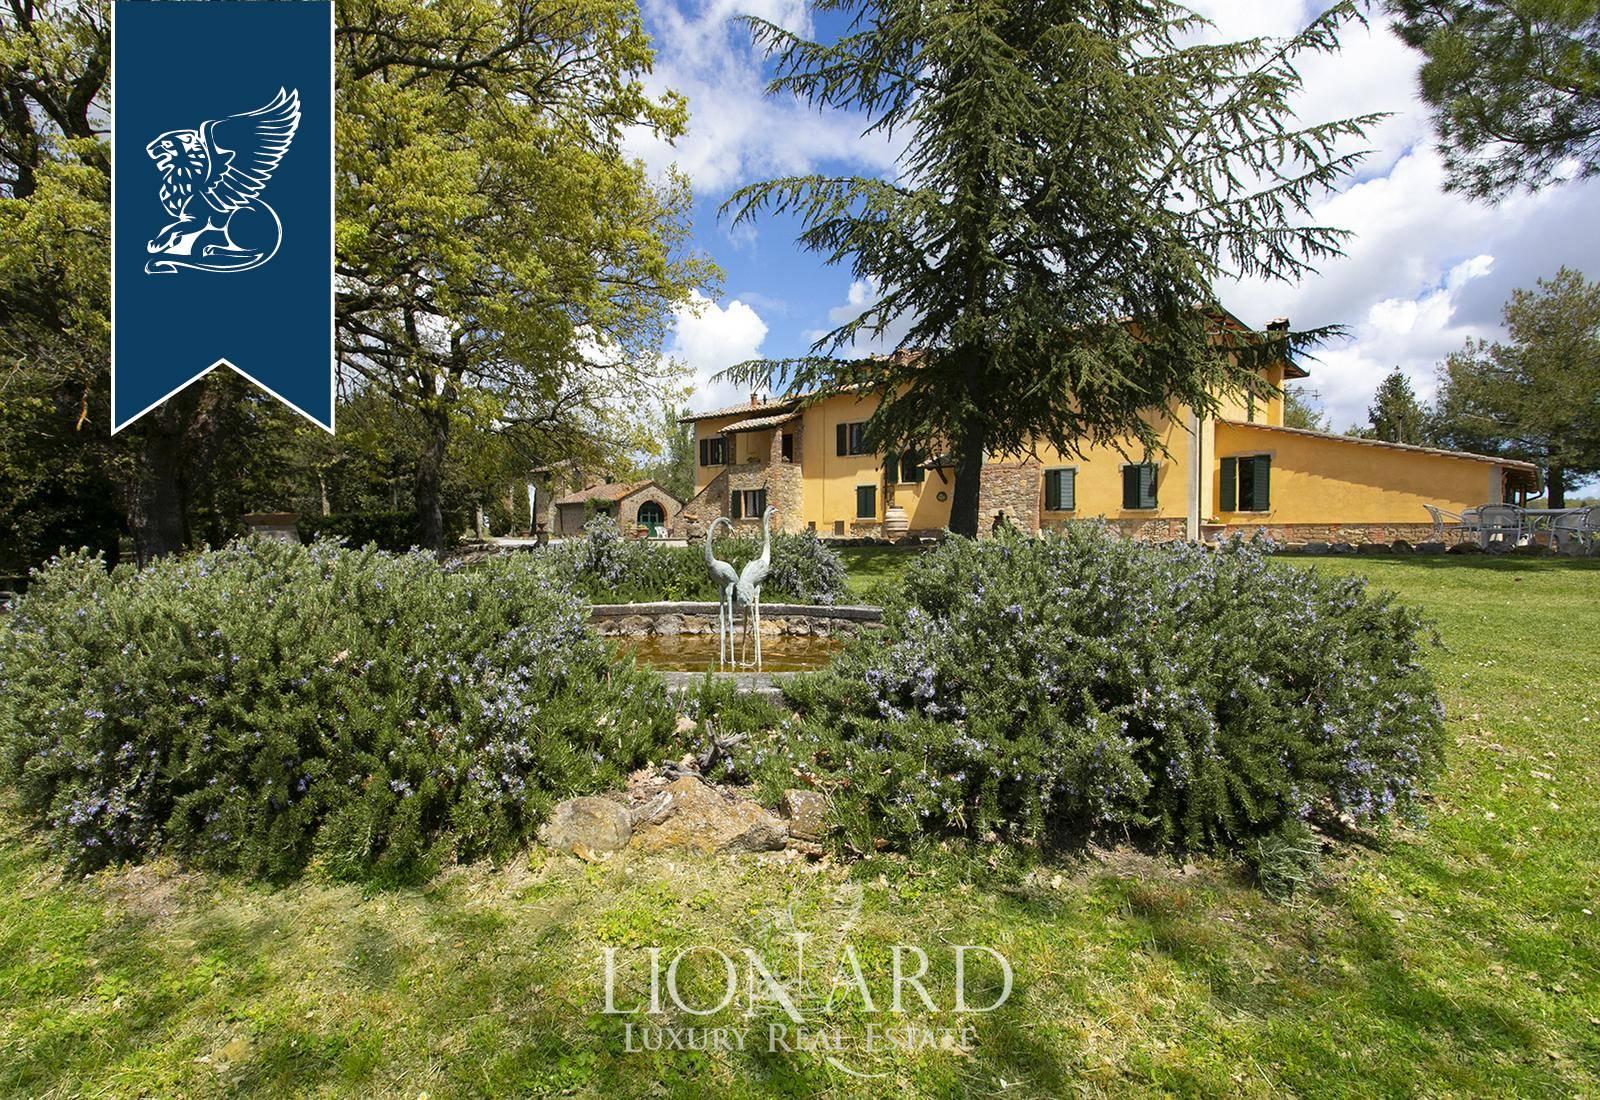 Agriturismo in Vendita a Montepulciano: 0 locali, 700 mq - Foto 6